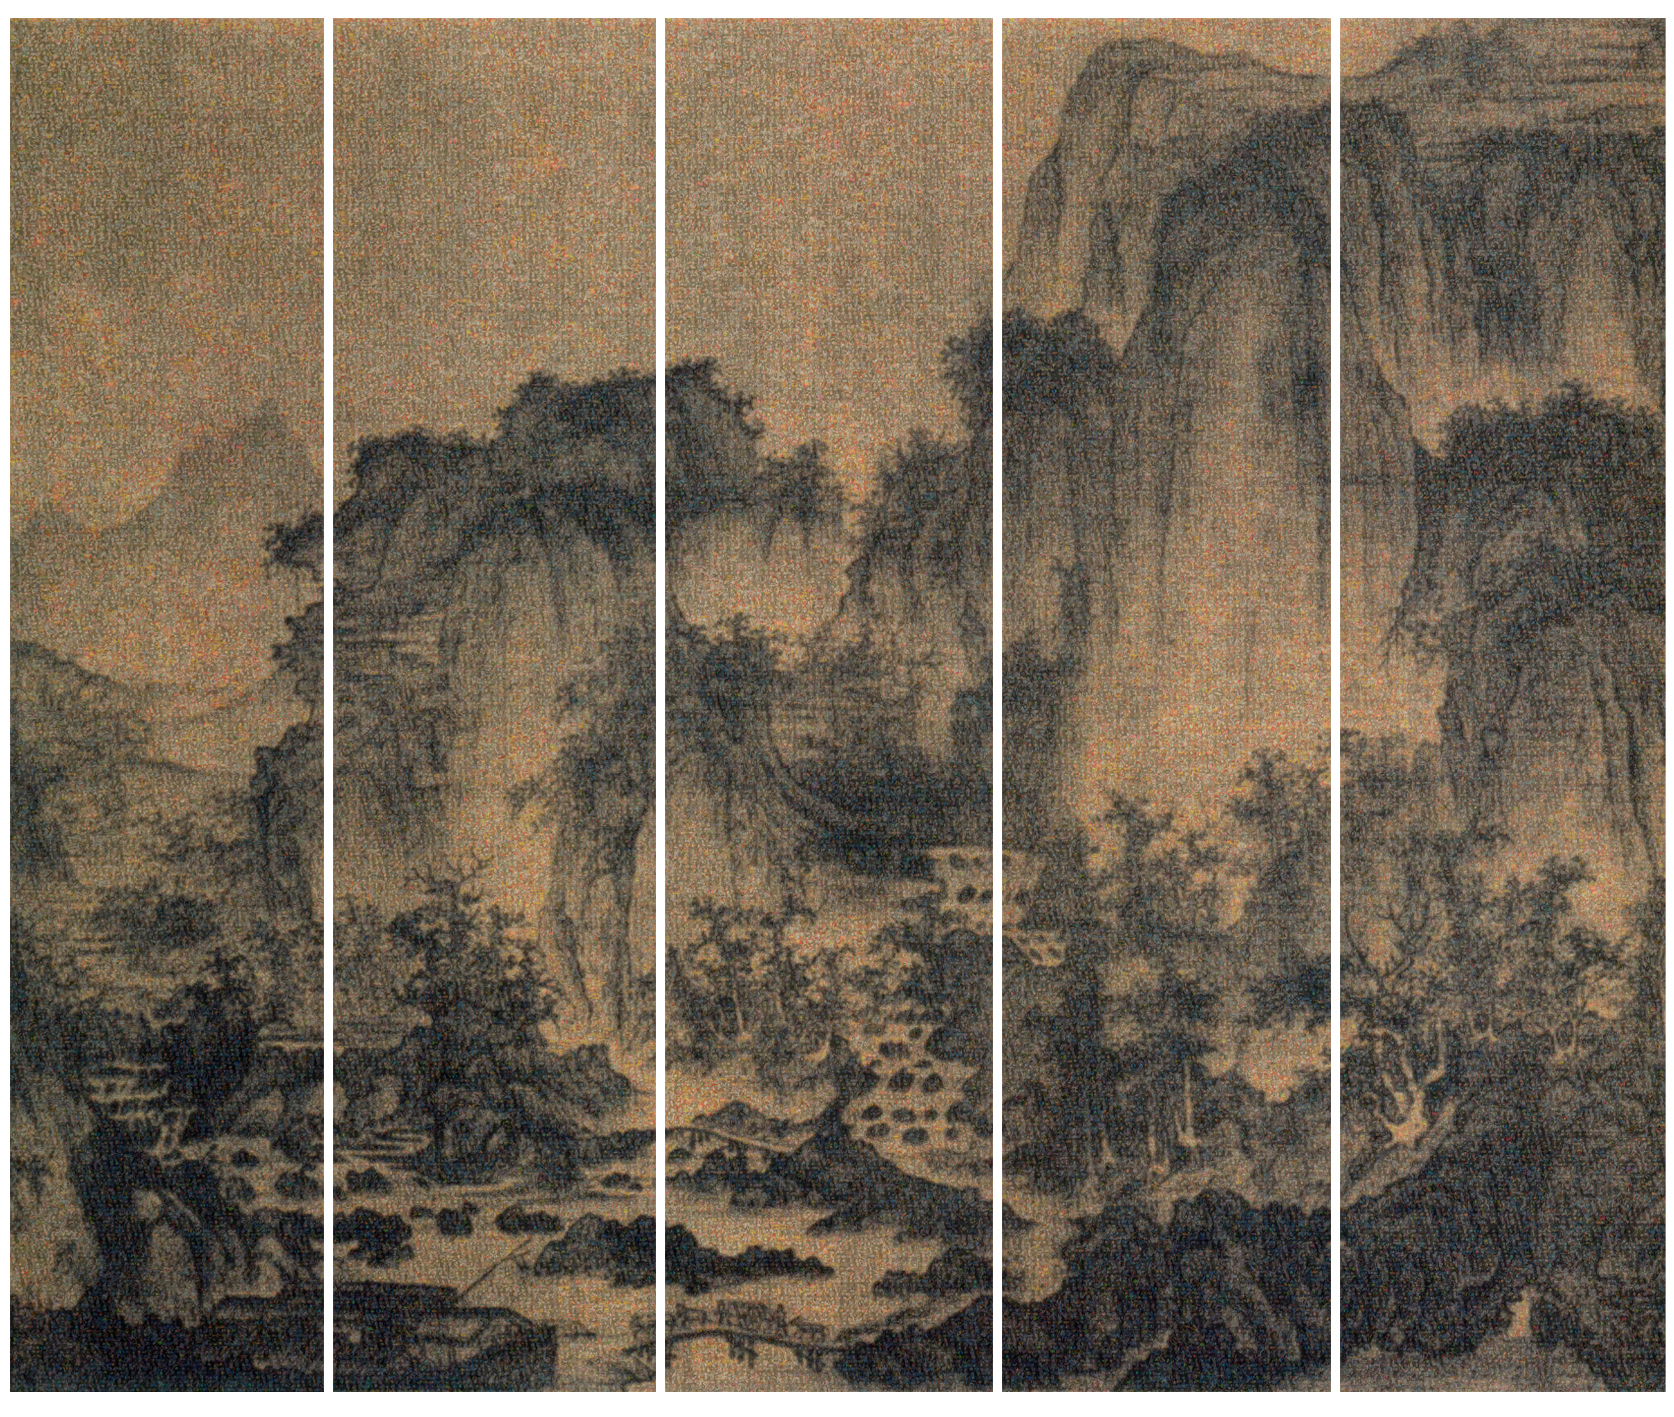 Guo Jian, The Landscape No.3,  inkjet pigment print, 5 panels,  2016, 200 x 235 cm (overall).